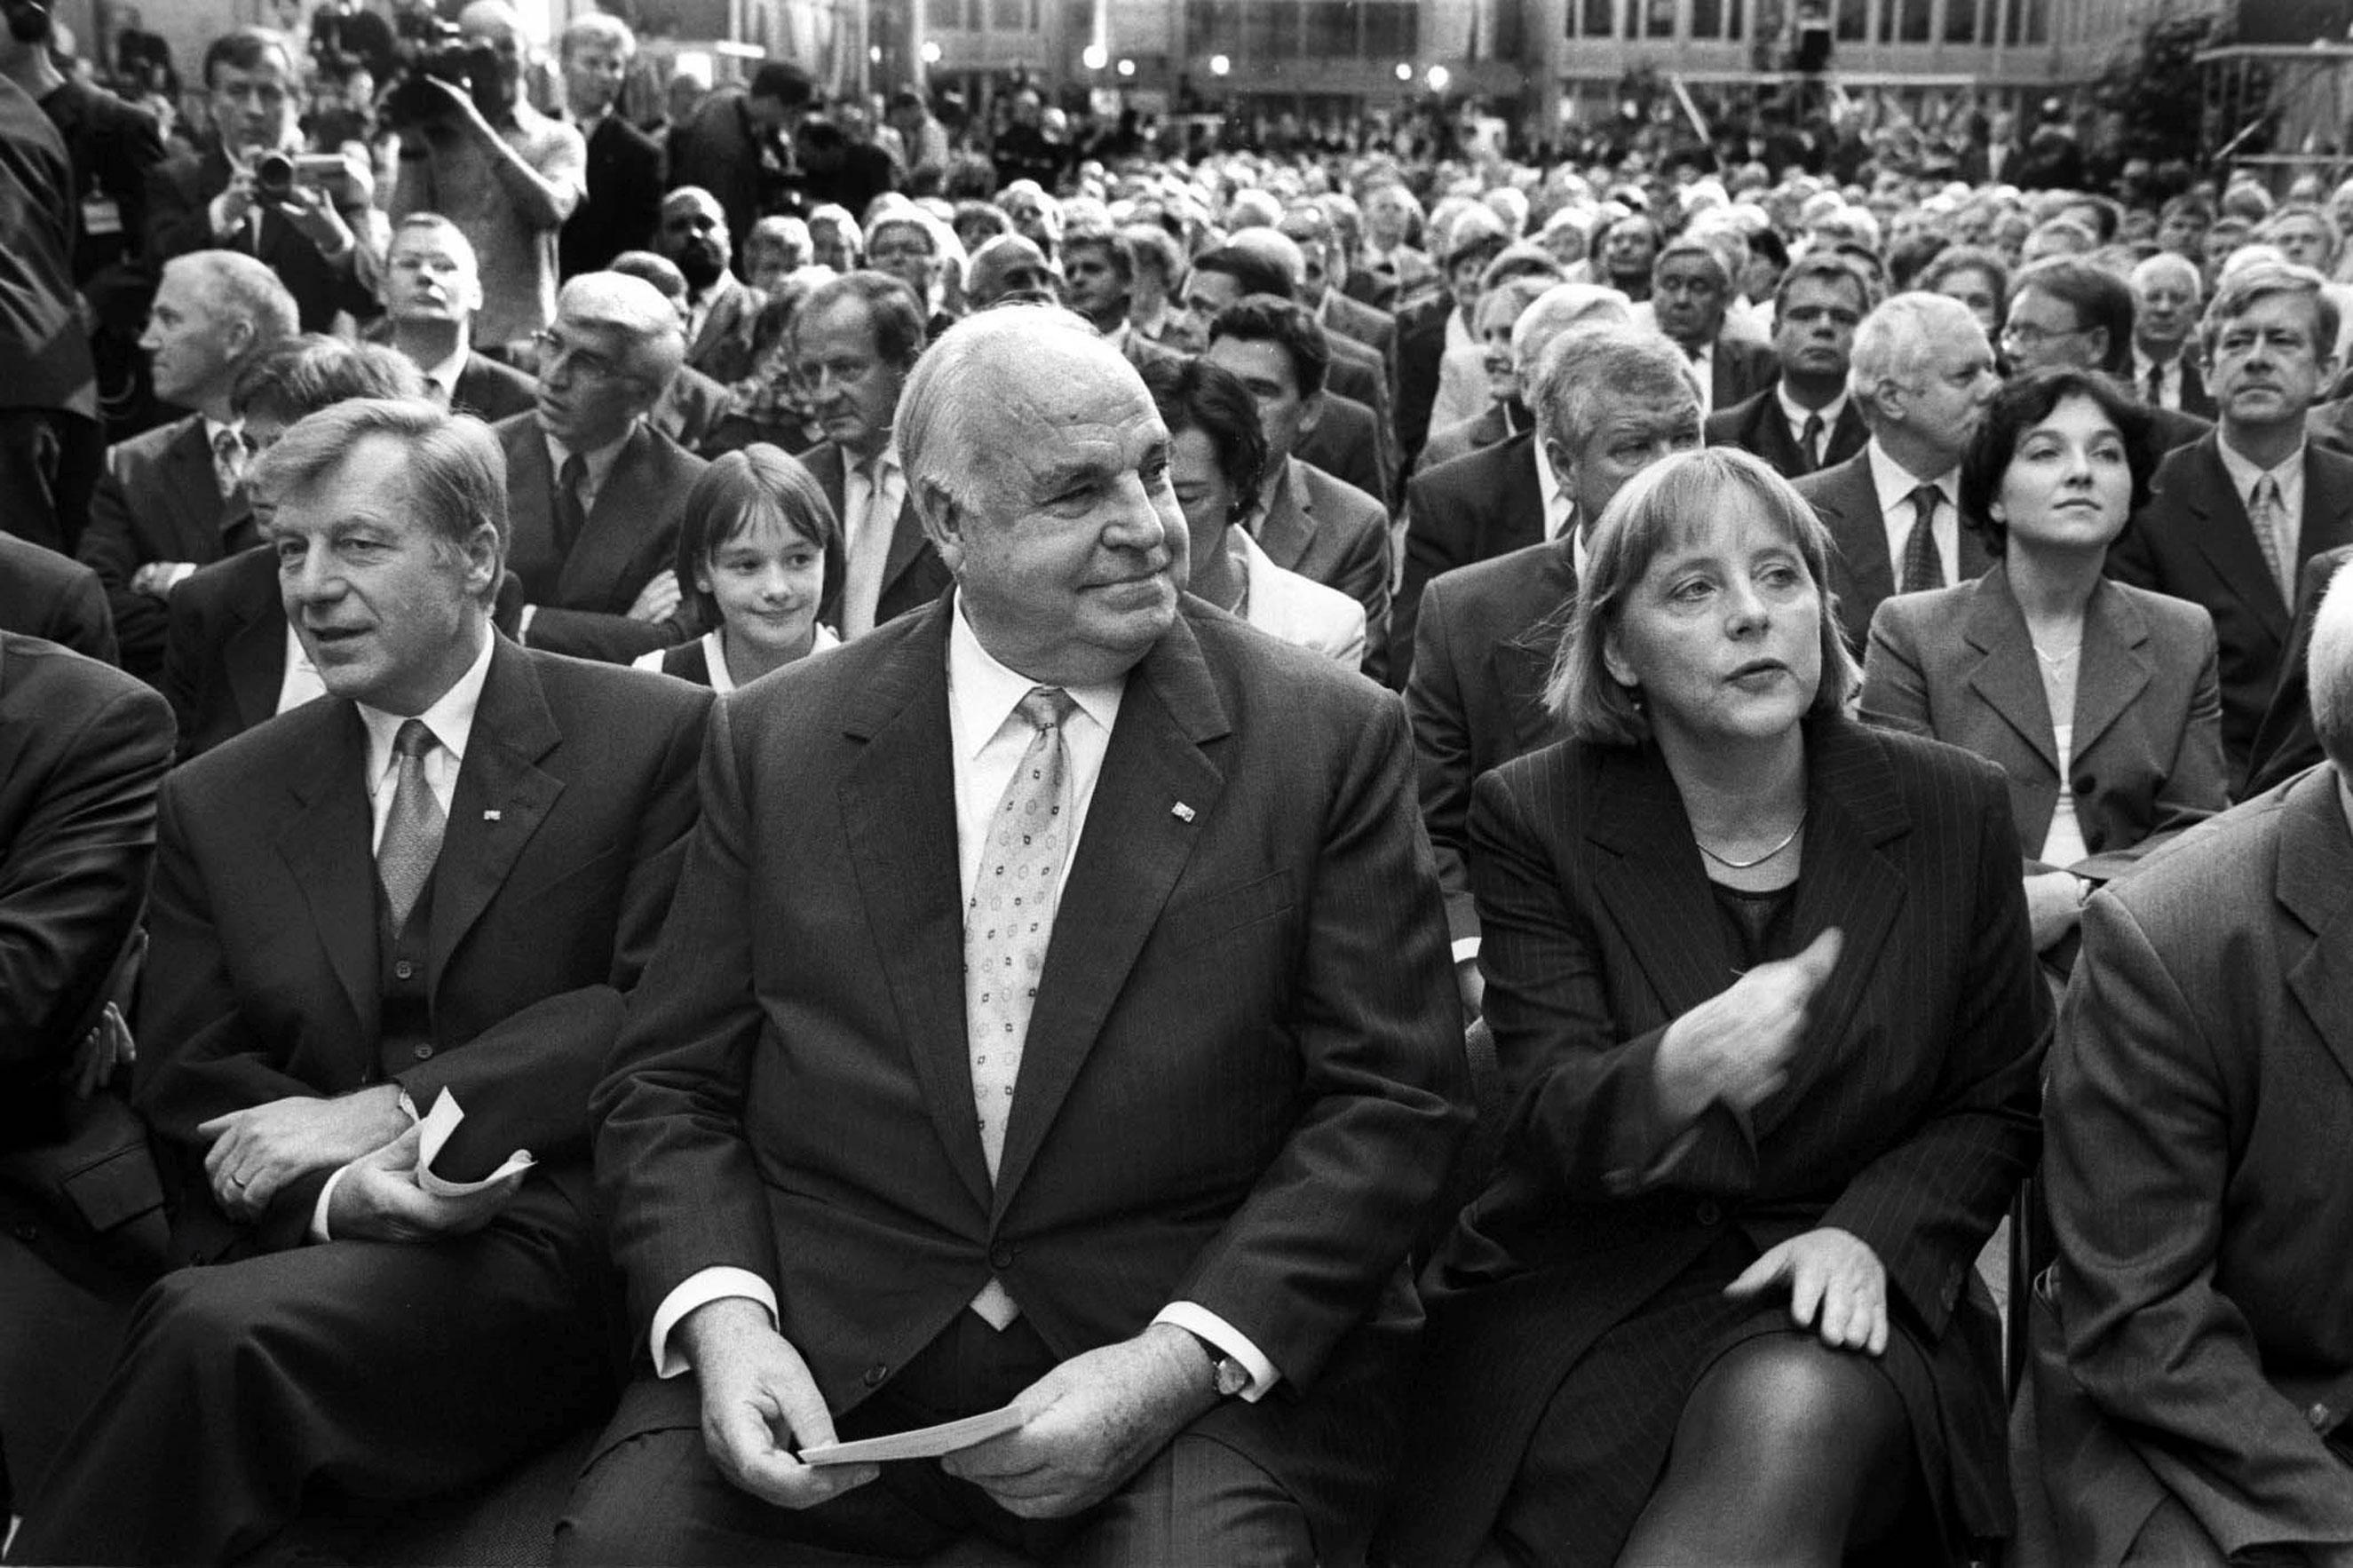 From left: Eberhard Diepgen, Helmut Kohl, and Angela Merkel attend a CDU ceremony on Oct. 1, 2000.